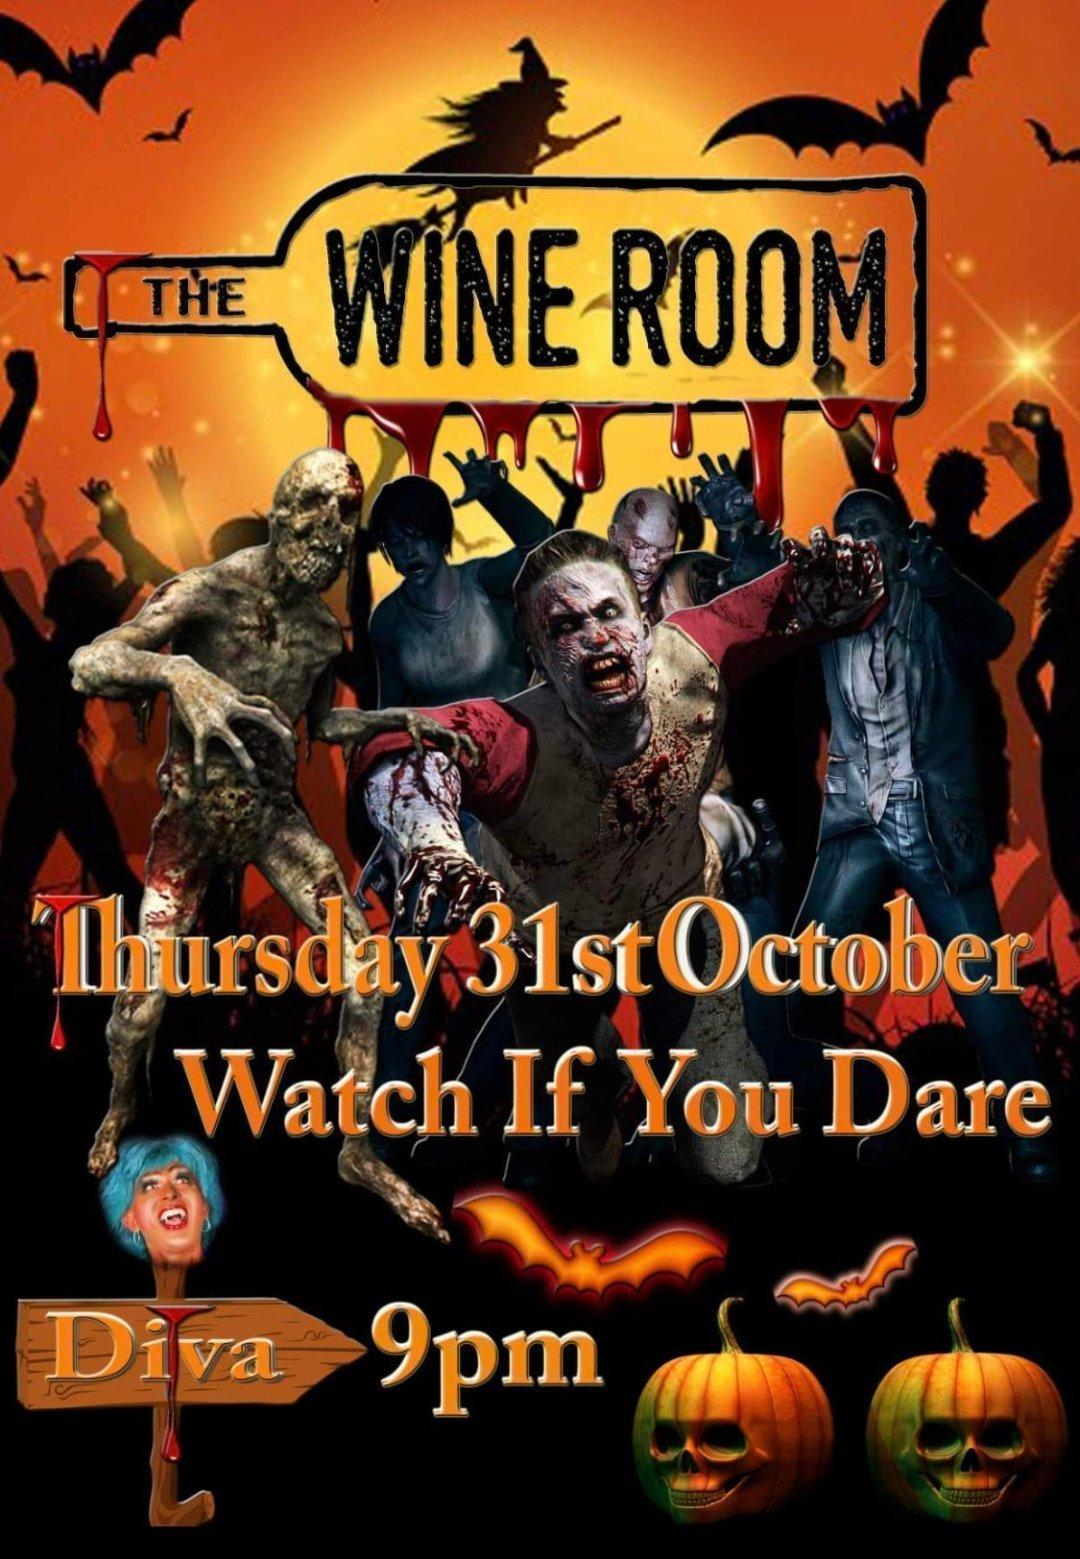 Spooky night nottingham